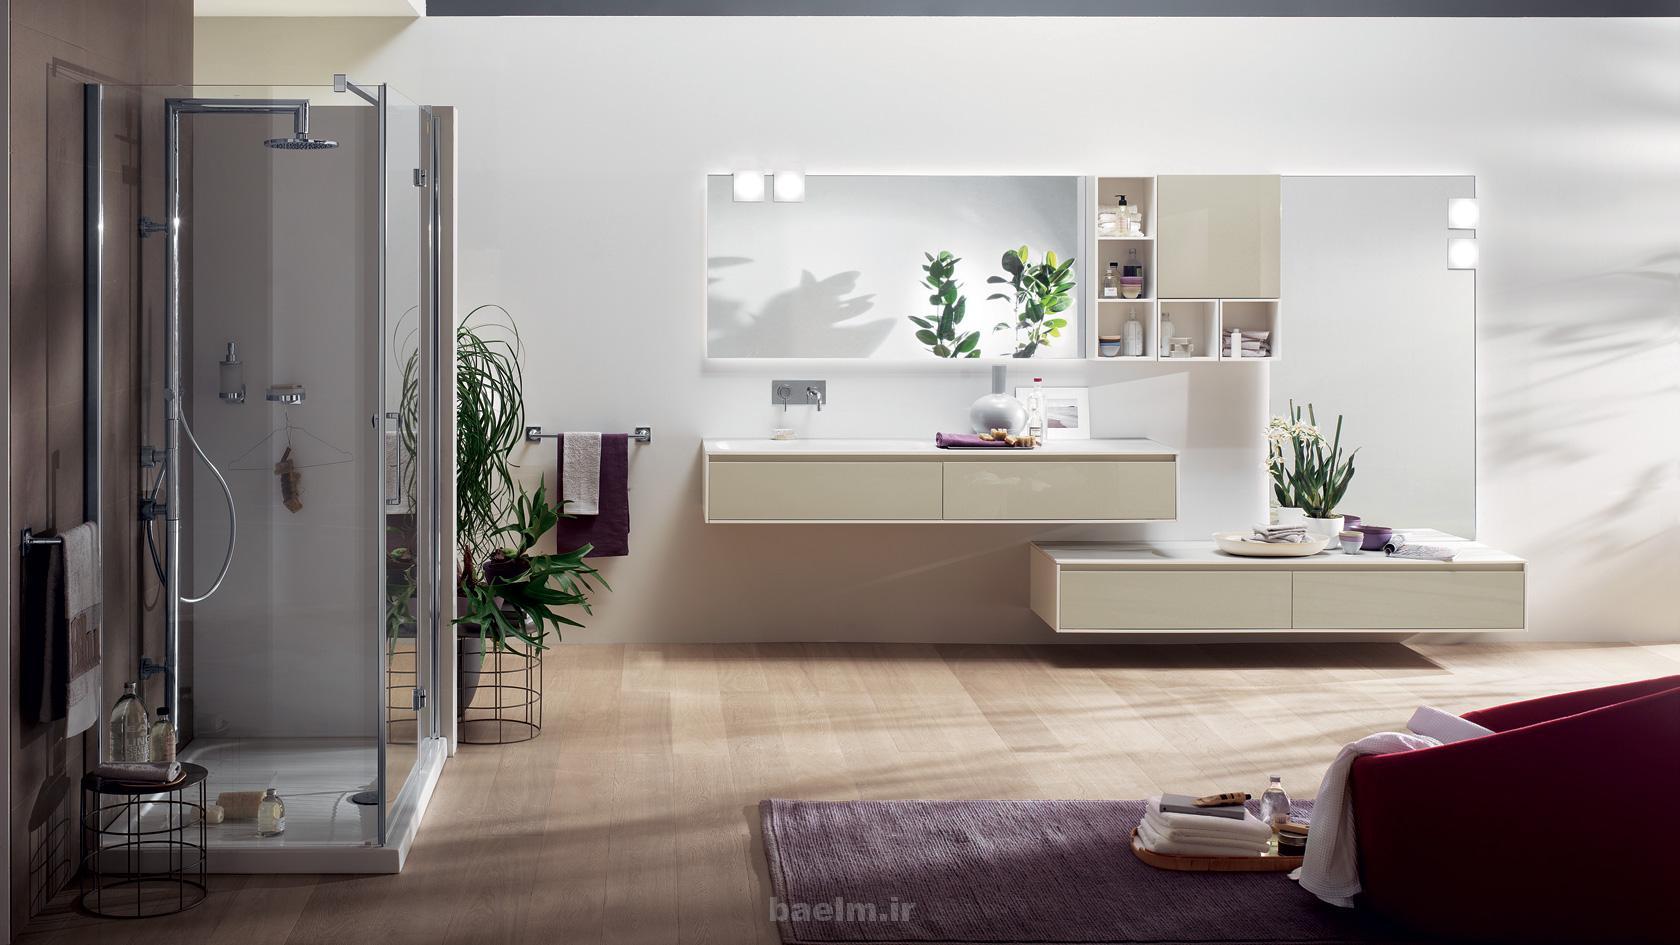 bathroom ideas 10 Bathroom Ideas